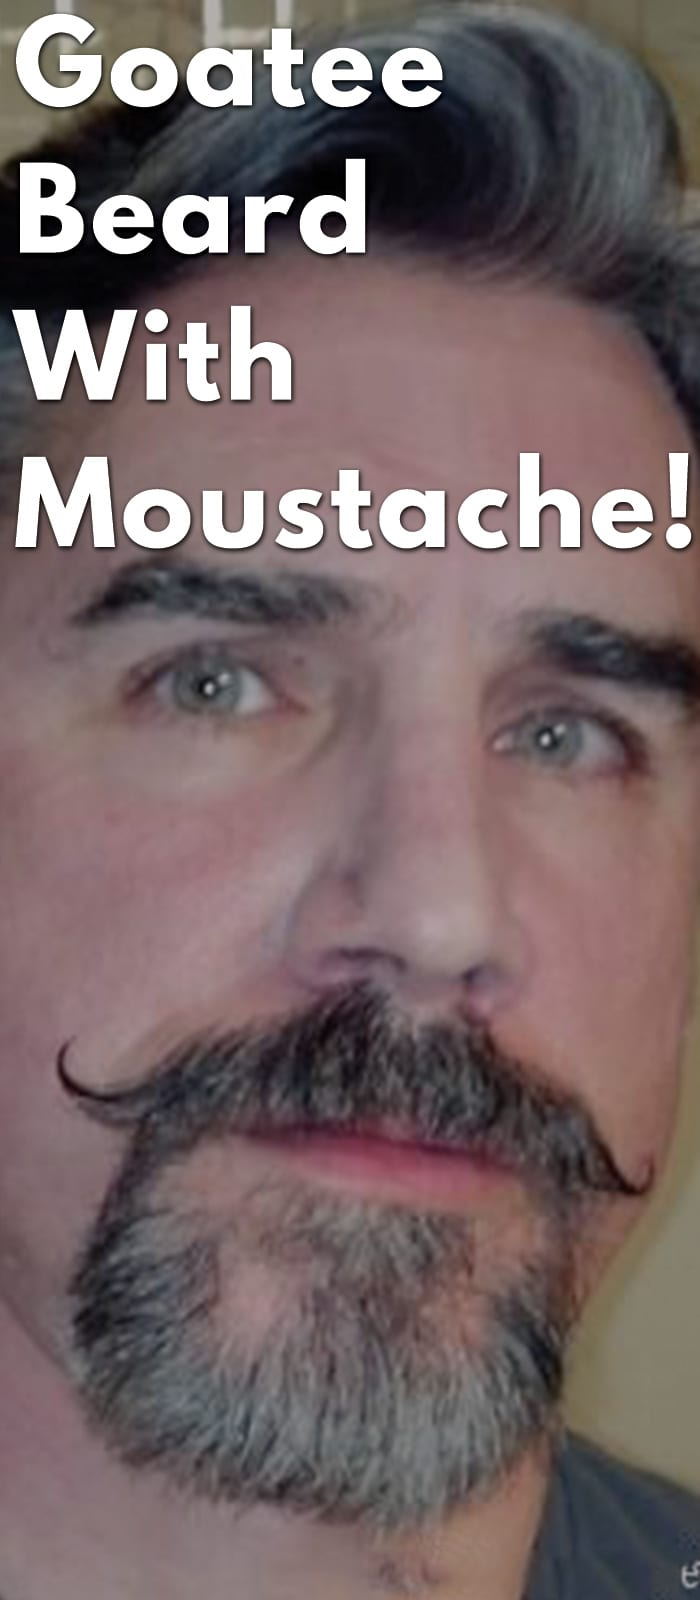 Goatee-Beard-With-Moustache!.